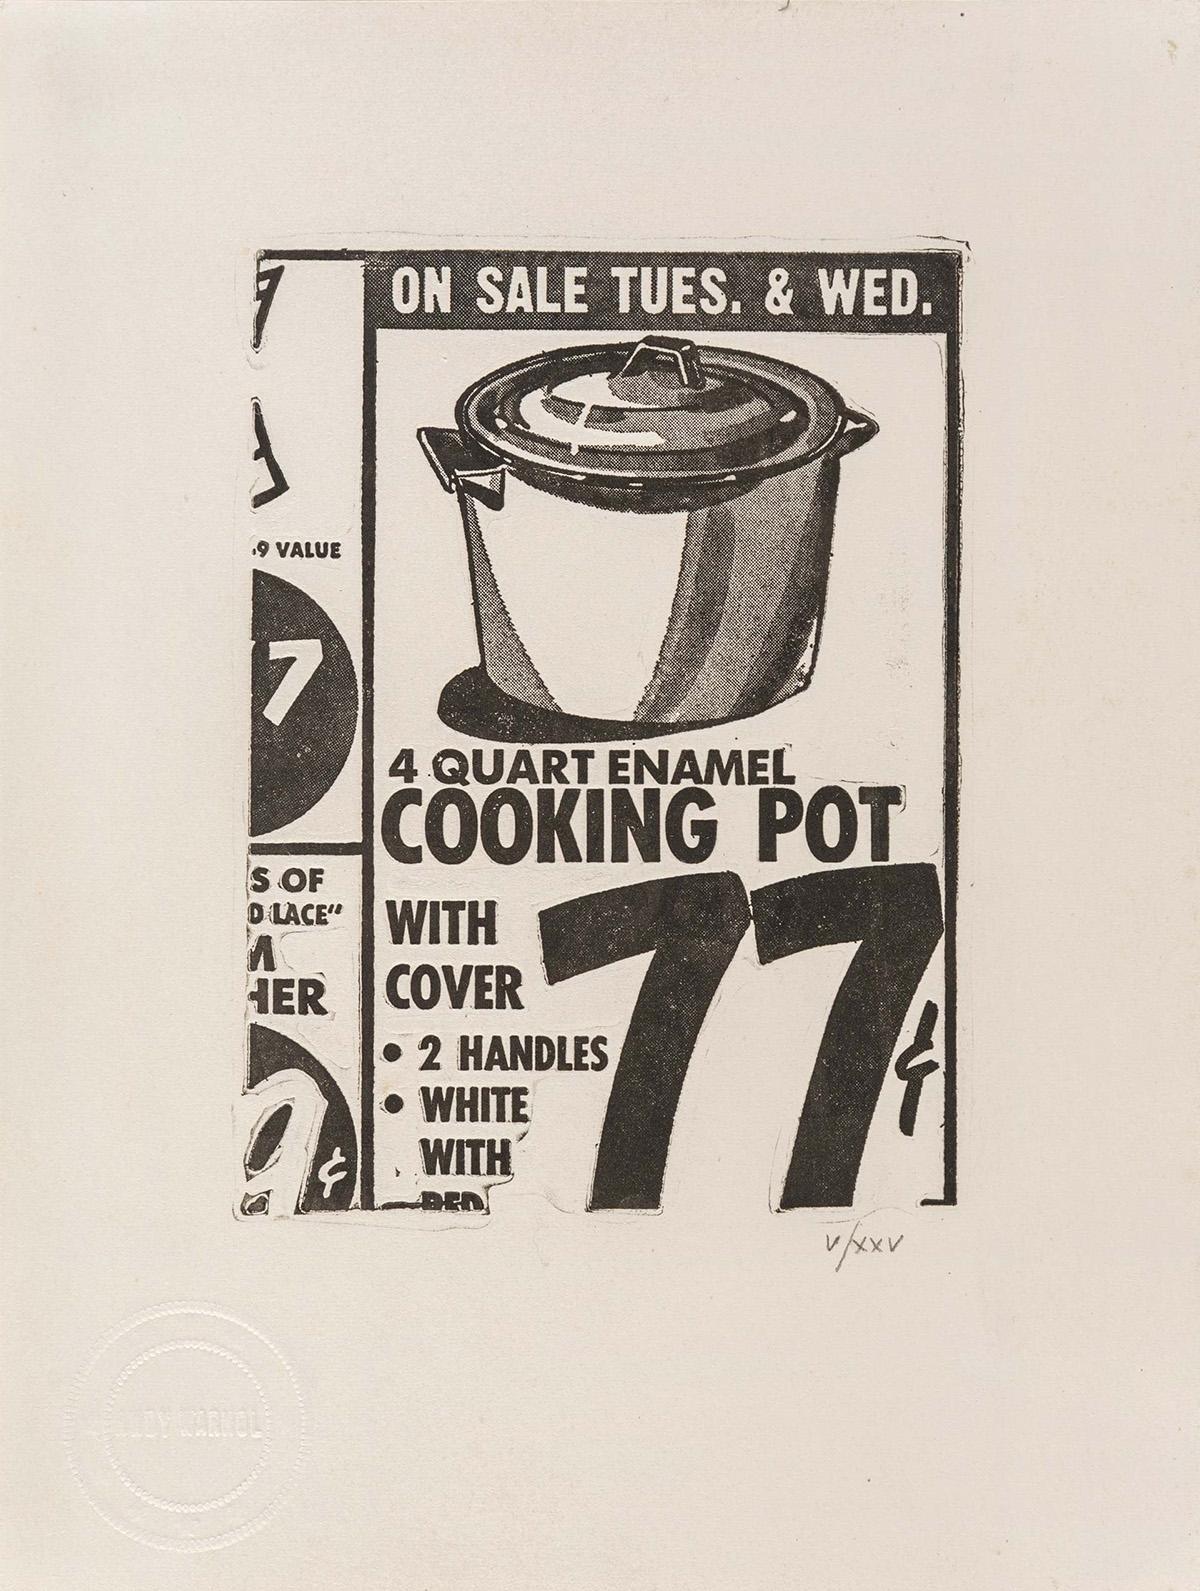 ANDY WARHOL Cooking Pot.